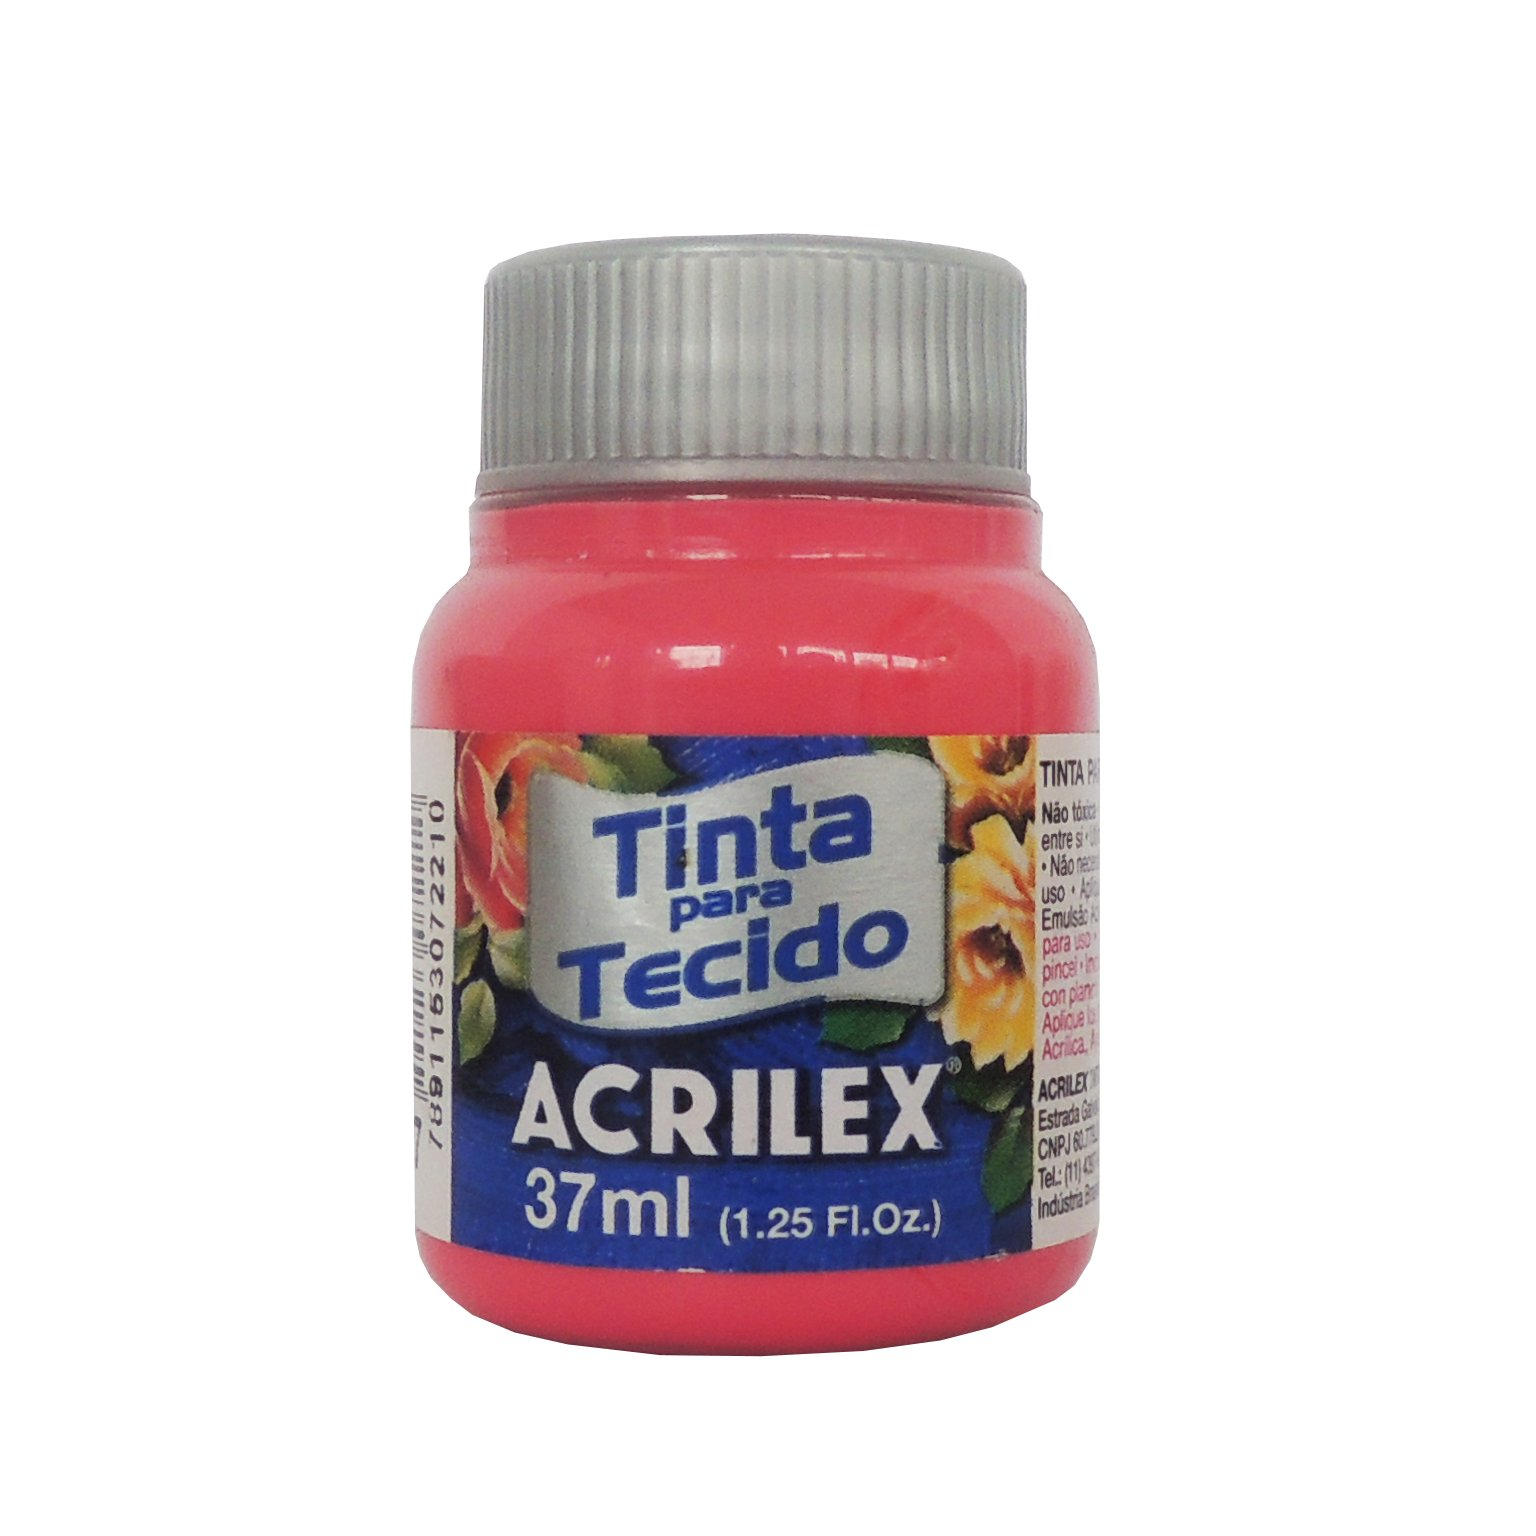 tinta-para-tecido-acrilex-37ml-527-pink